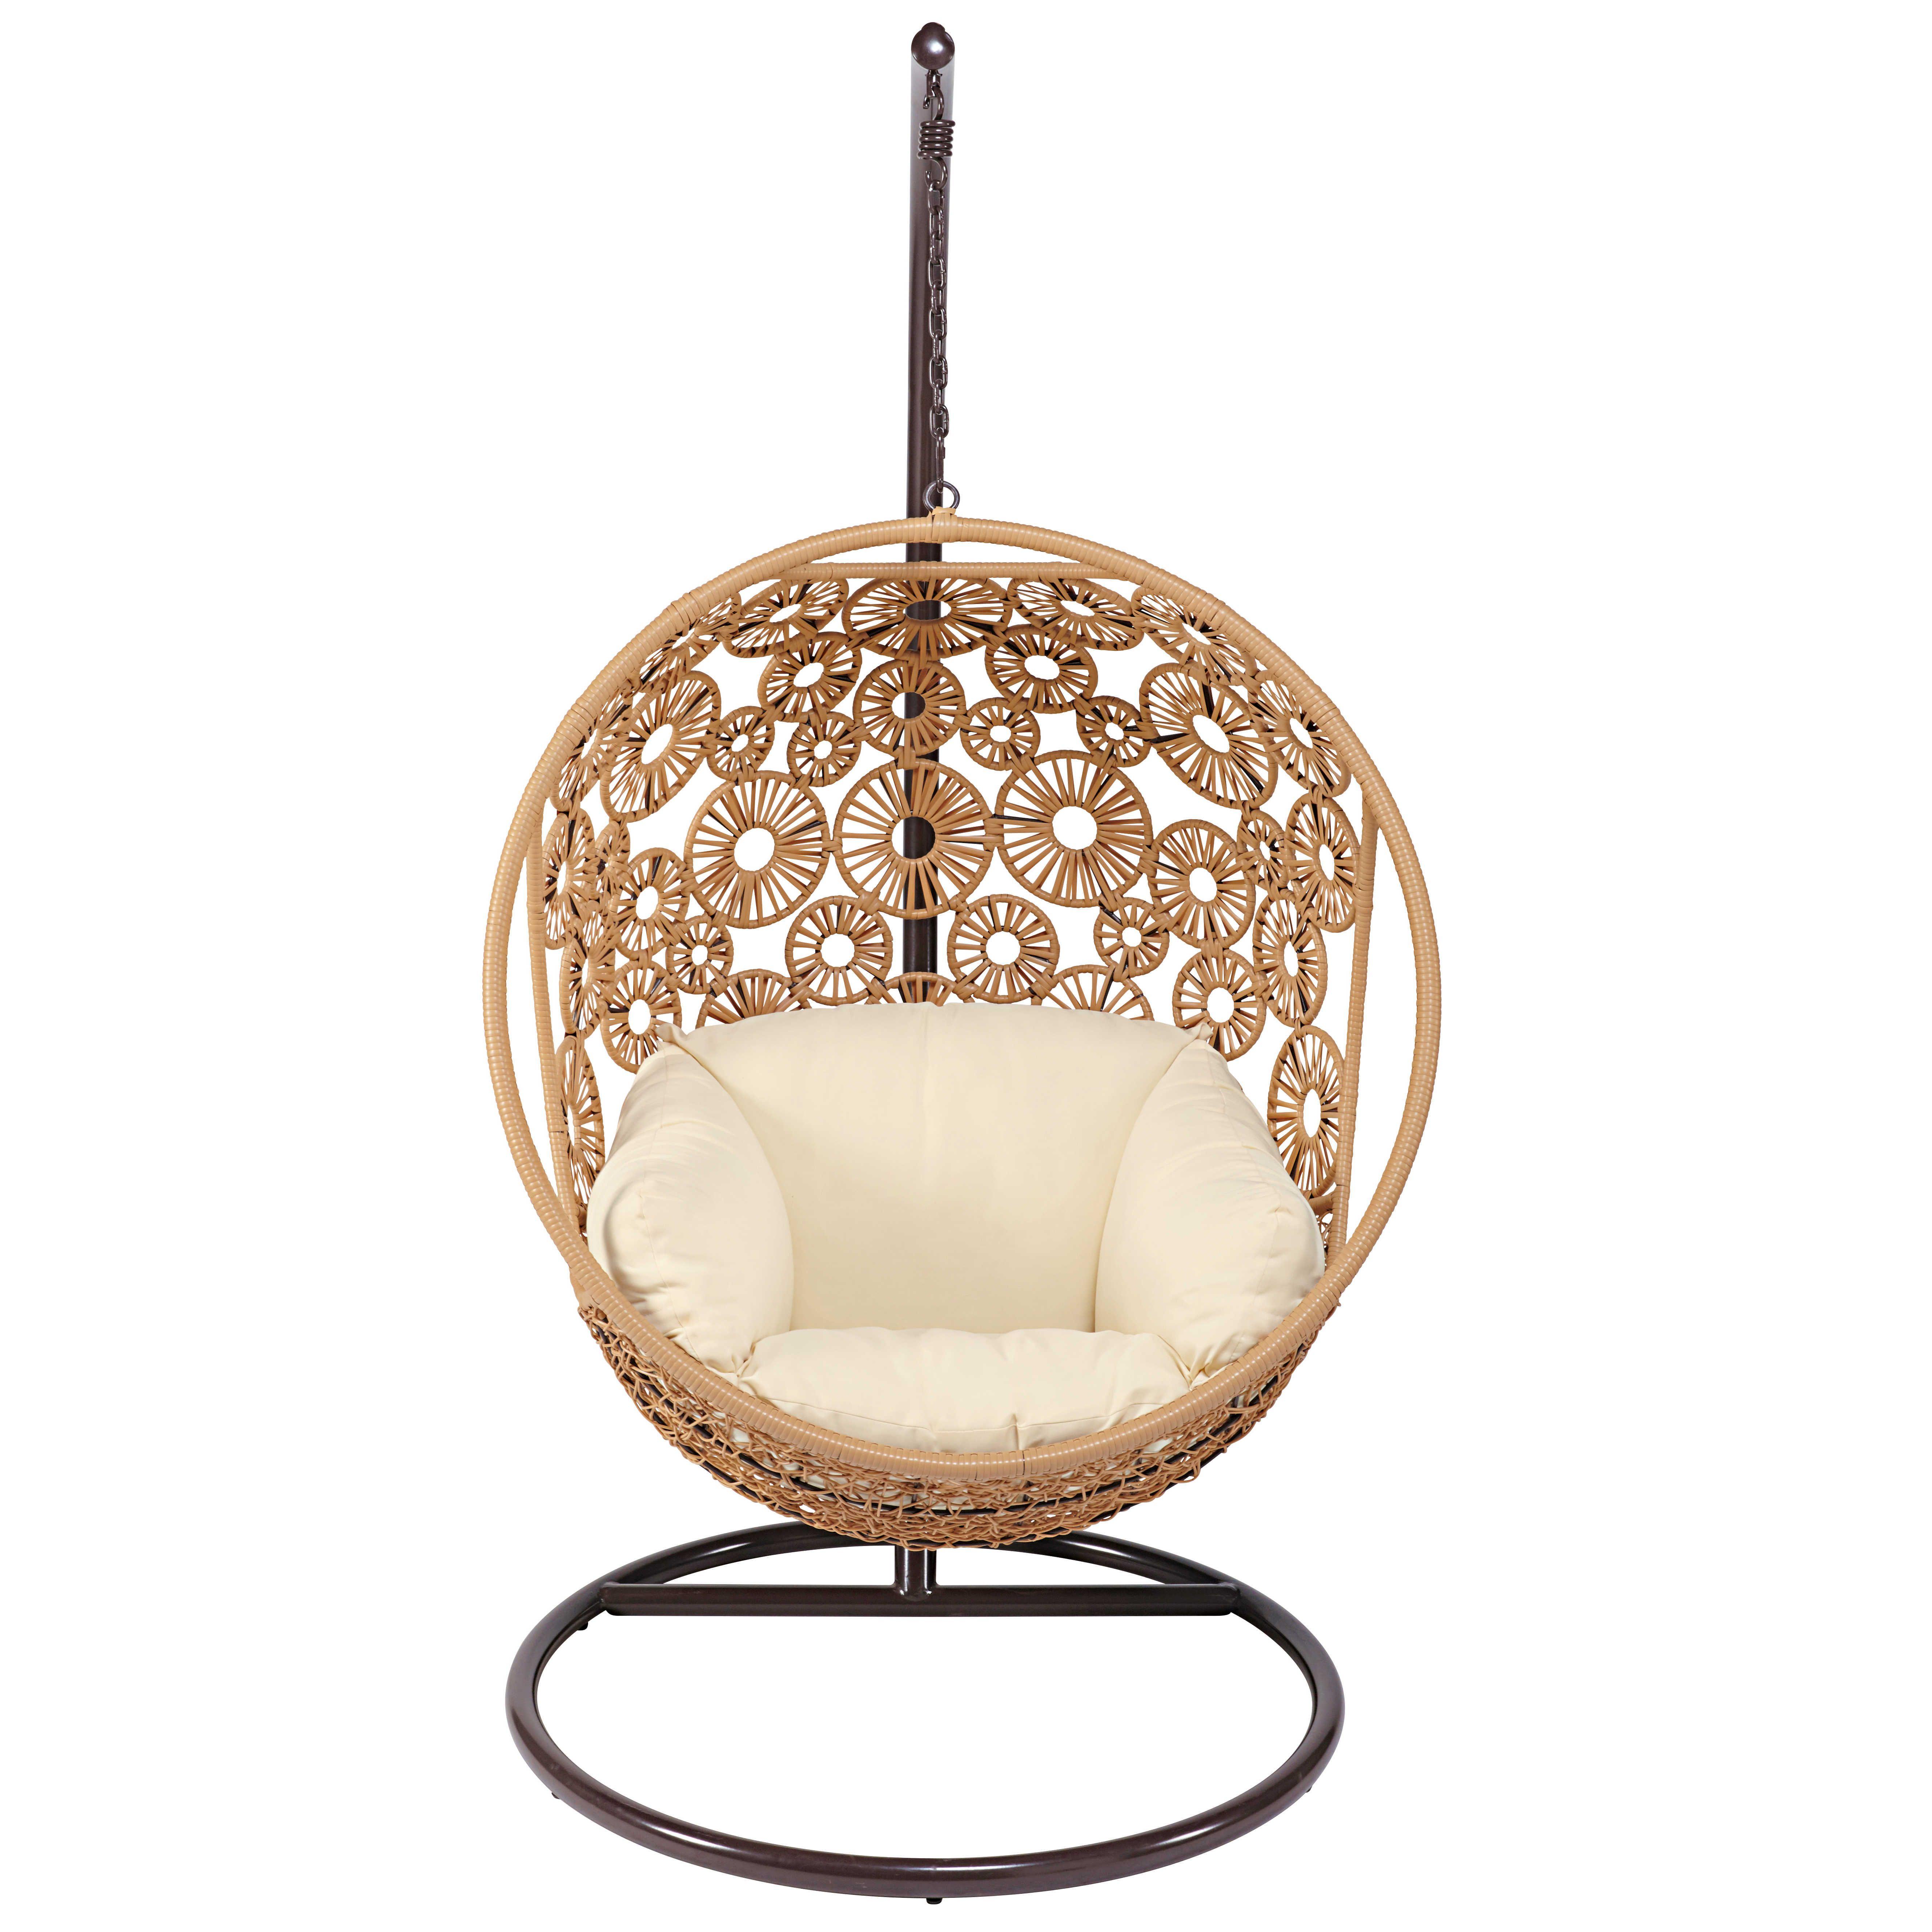 Mobilier de jardin en 2019 | silla colgante | Mobilier ...